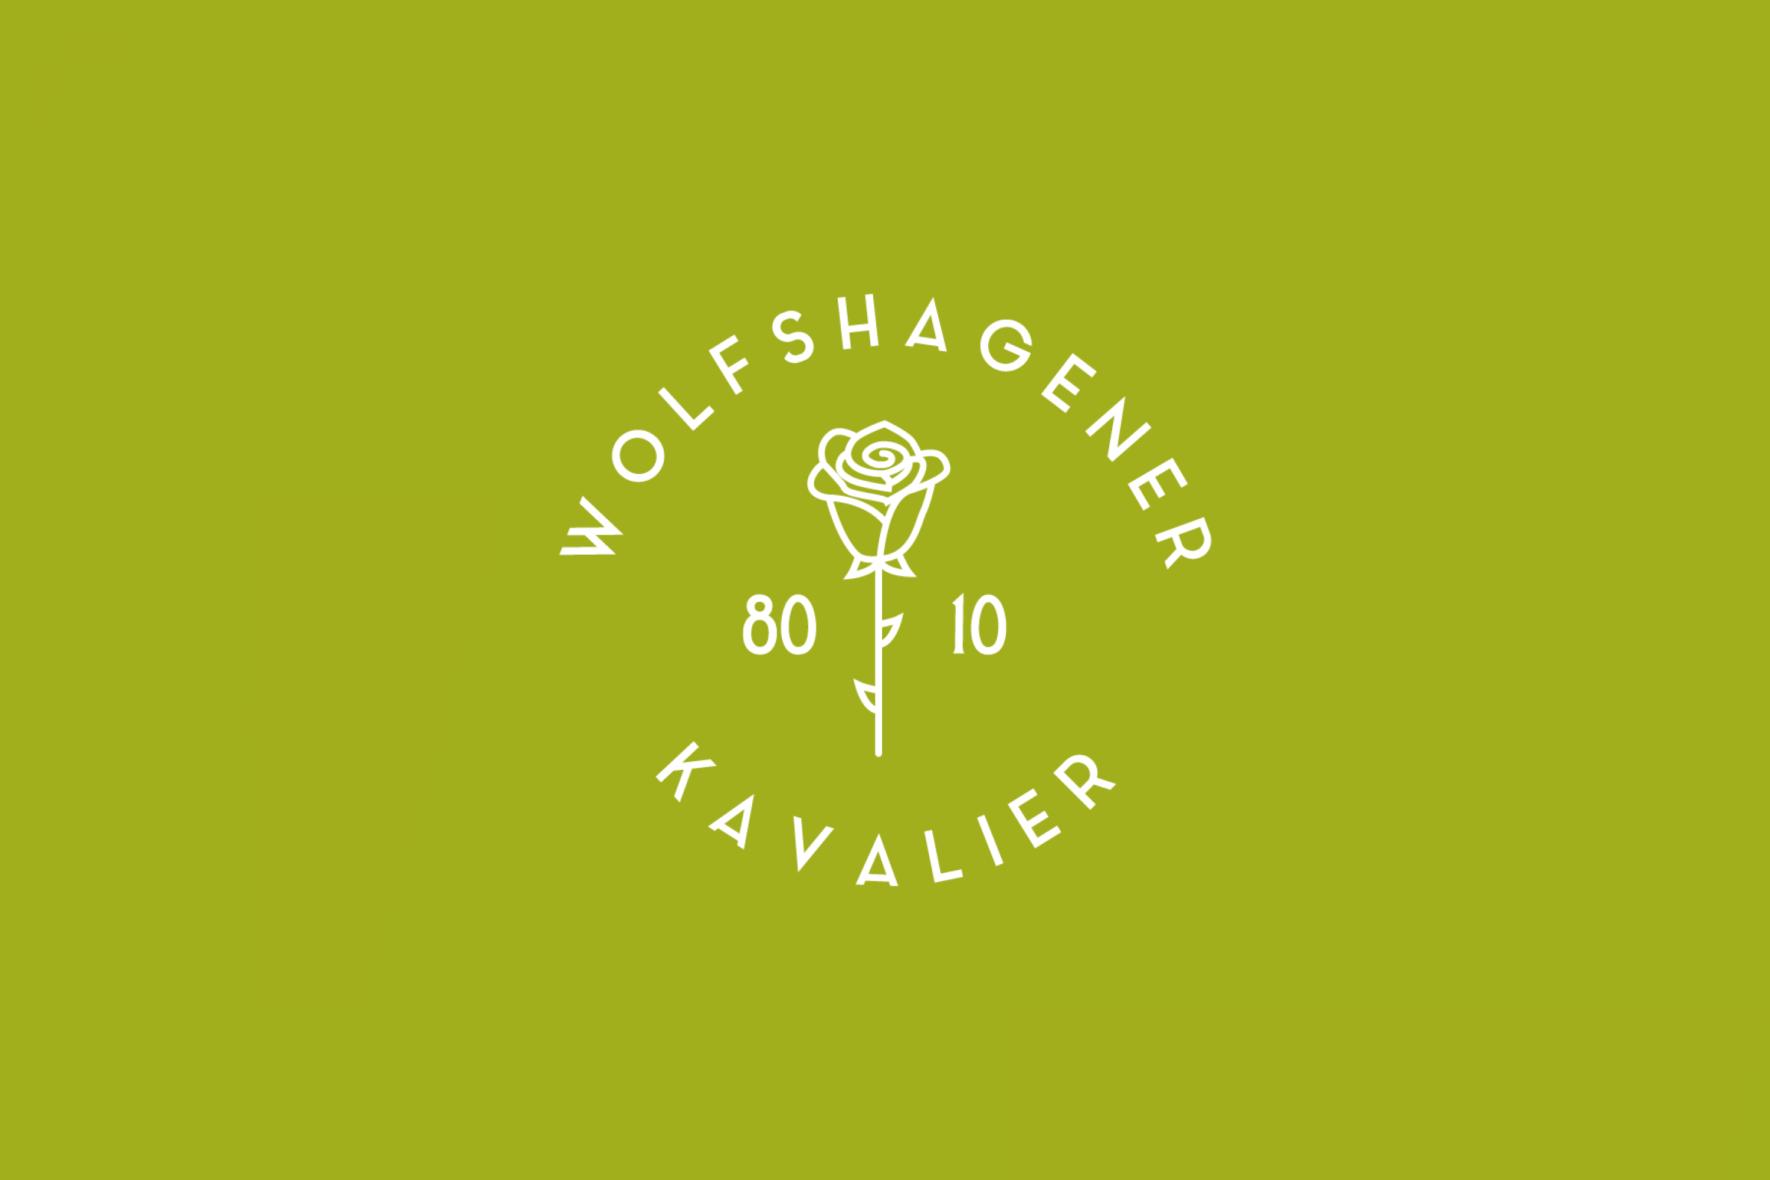 Vorschau-Bild: Immobilienbranding: Kavalierstraße 10 – Berlin Pankow